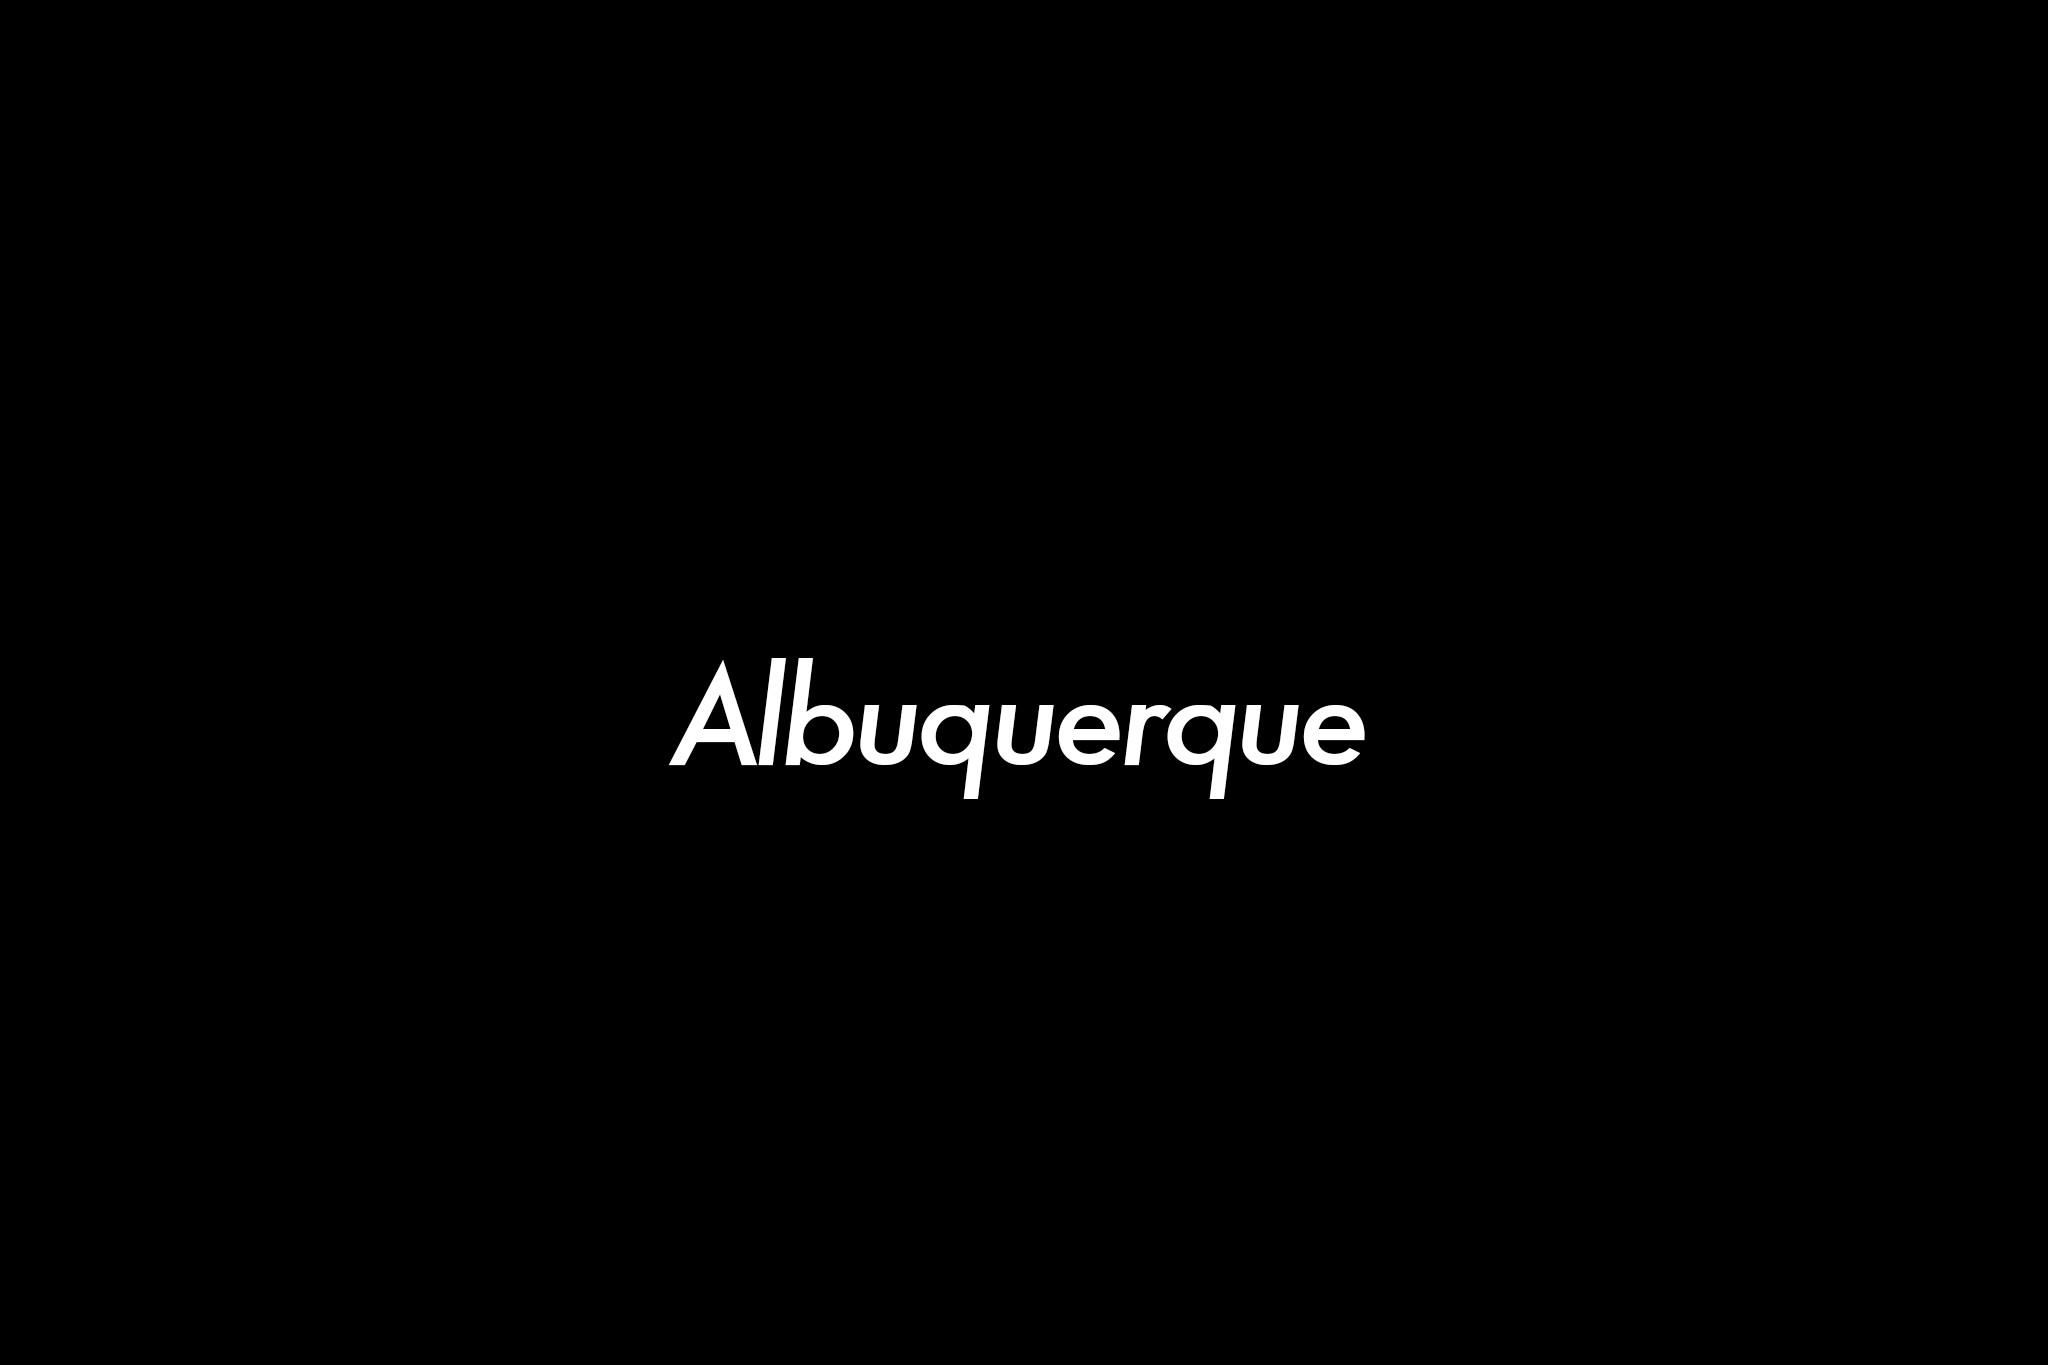 Albuquerque.jpg